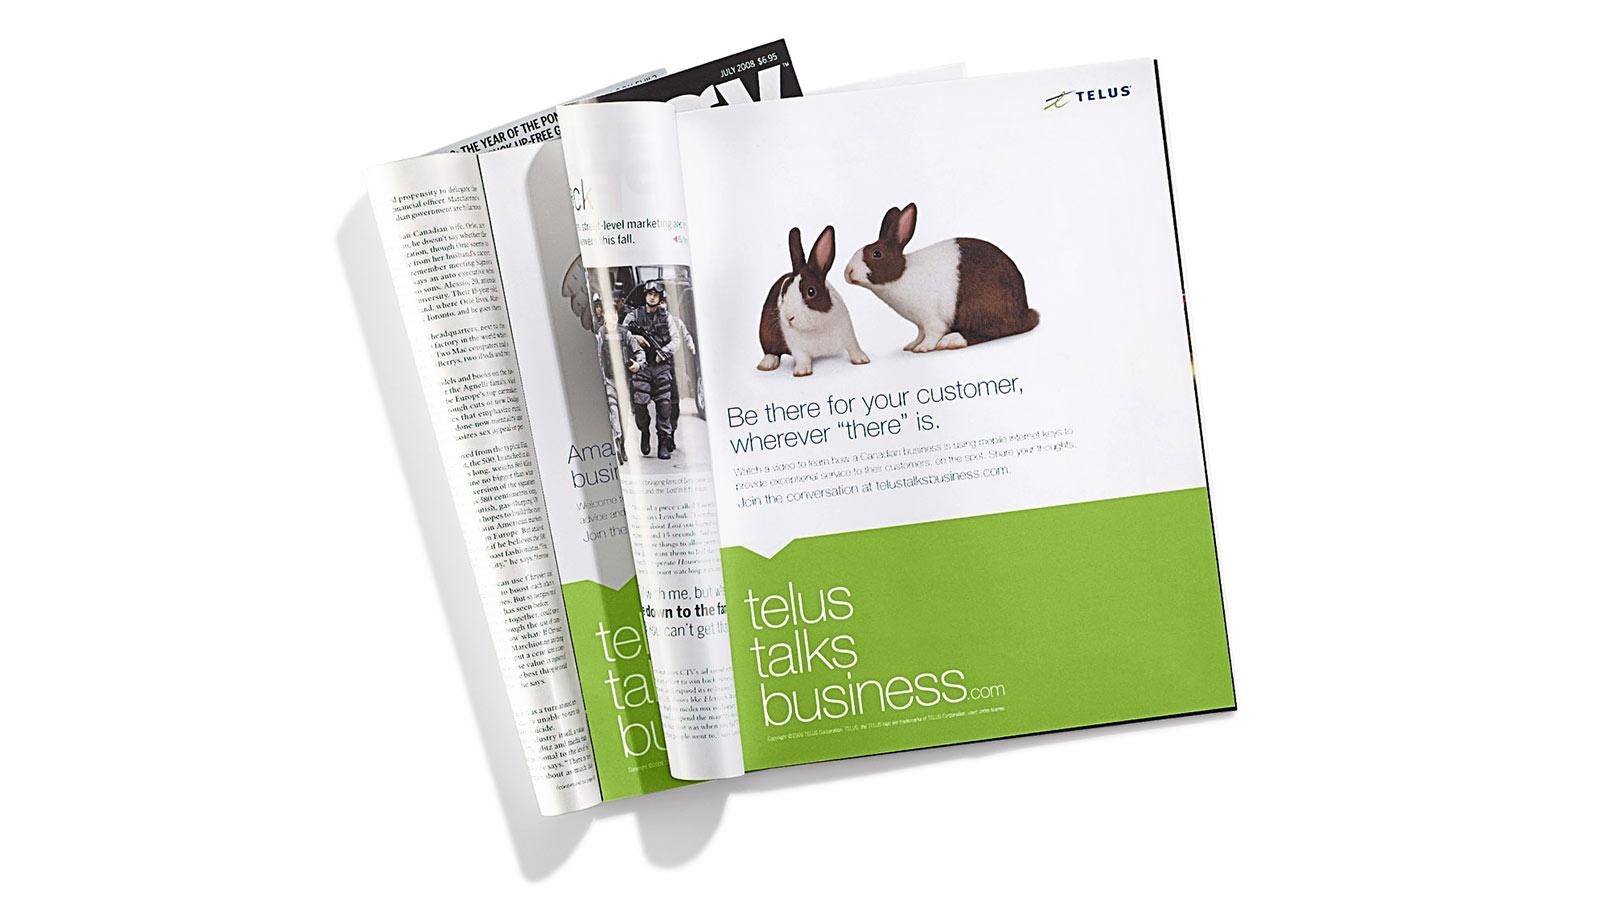 TELUS | TELUS Talks Business Campaign | App Development, Content Strategy & Marketing, CRM (Customer Relationship Marketing), Digital Innovation, Digital Marketing, Email Marketing, Responsive Design, Strategy